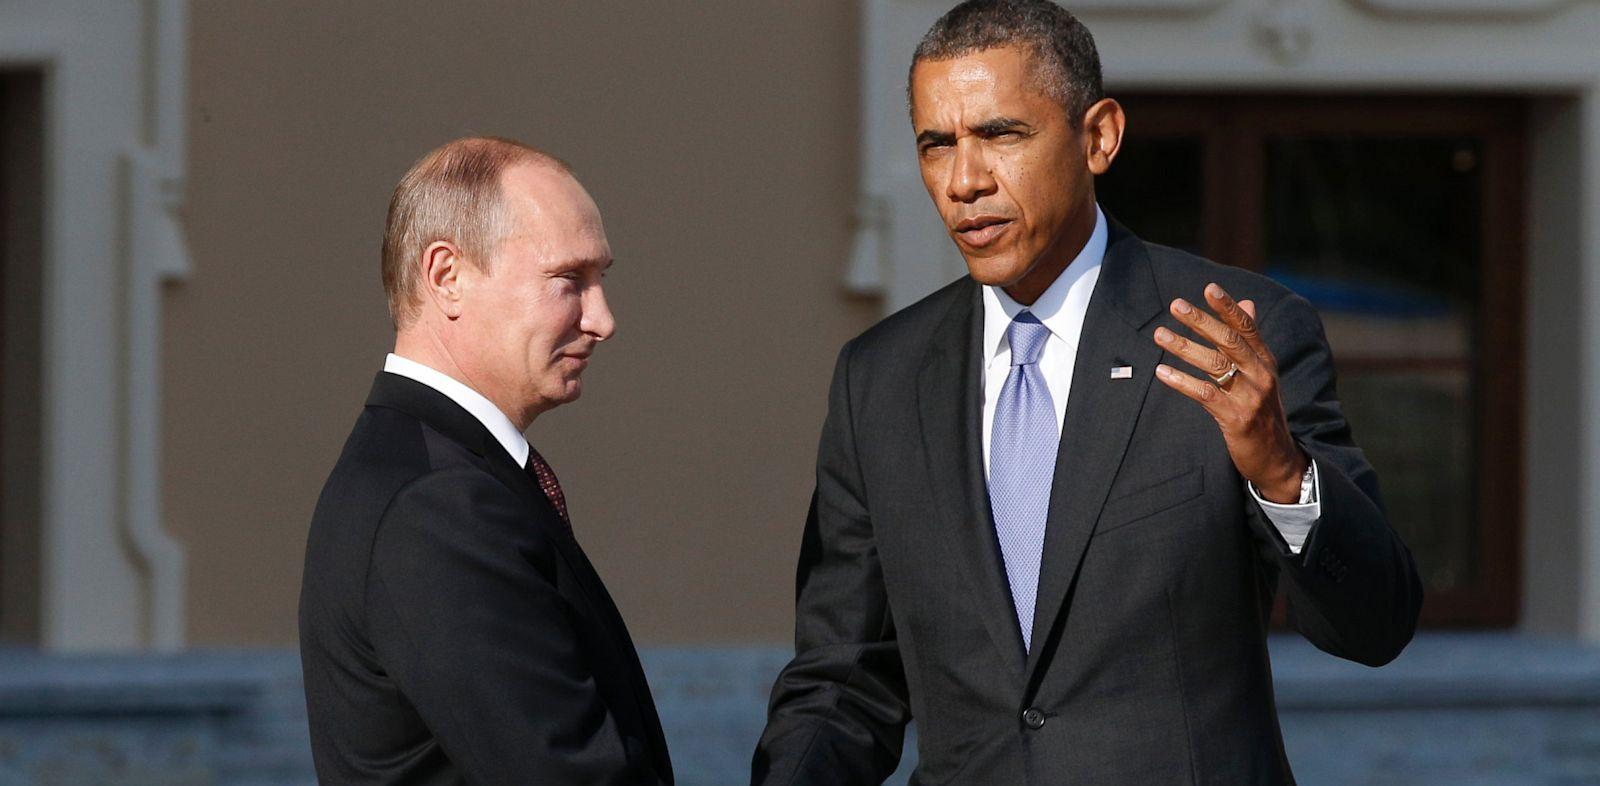 PHOTO: Vladimir Putin and Barack Obama arrive for G-20